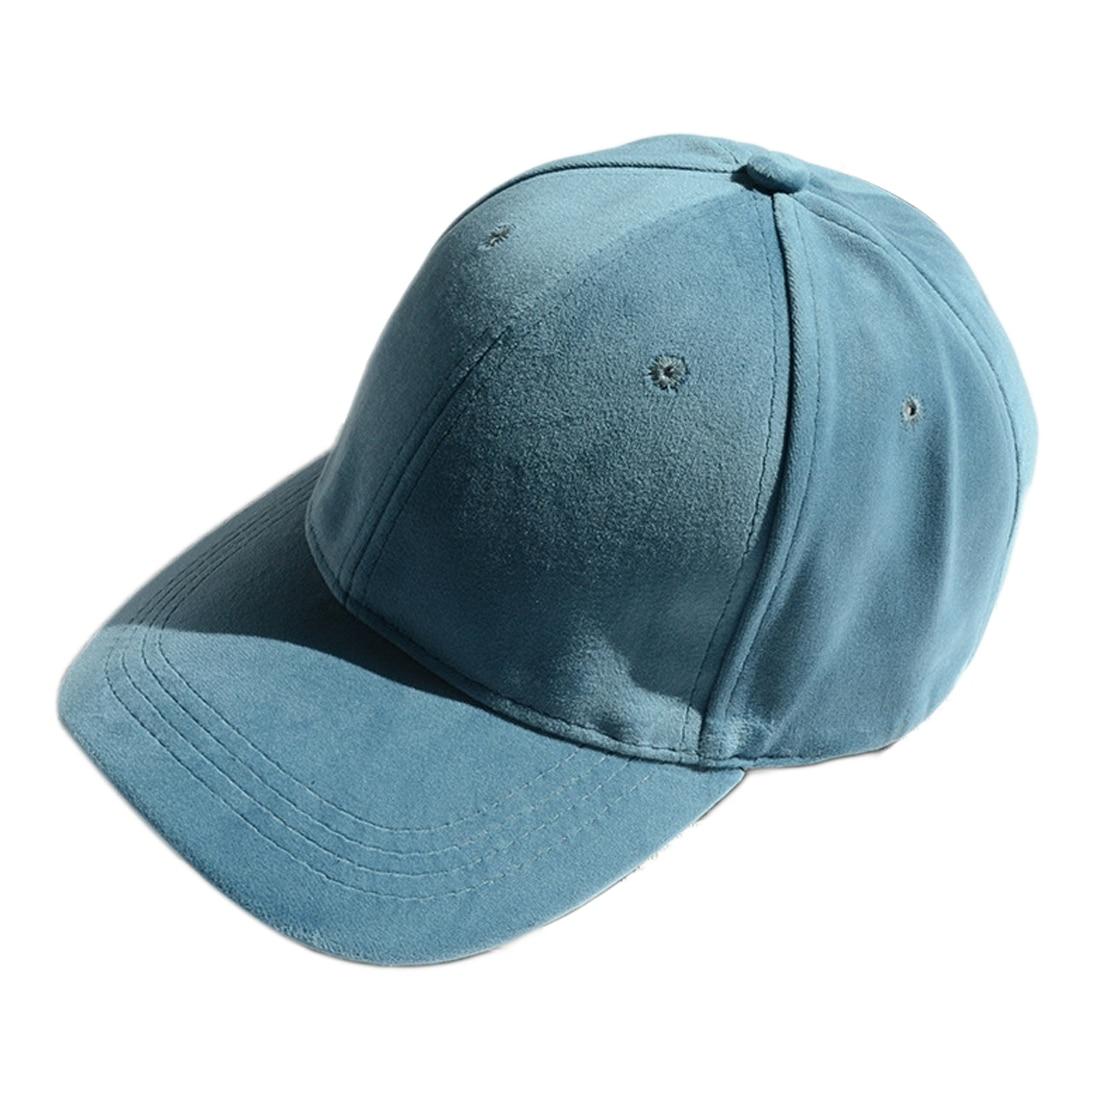 Aliexpress.com   Buy Hot Women Velvet Baseball Cap Mens Casquette Bones cap  Fashion Snapback Cap Hip Hop Flat Hat Women Gorras from Reliable gorra  fashion ... 8d36208f8cef